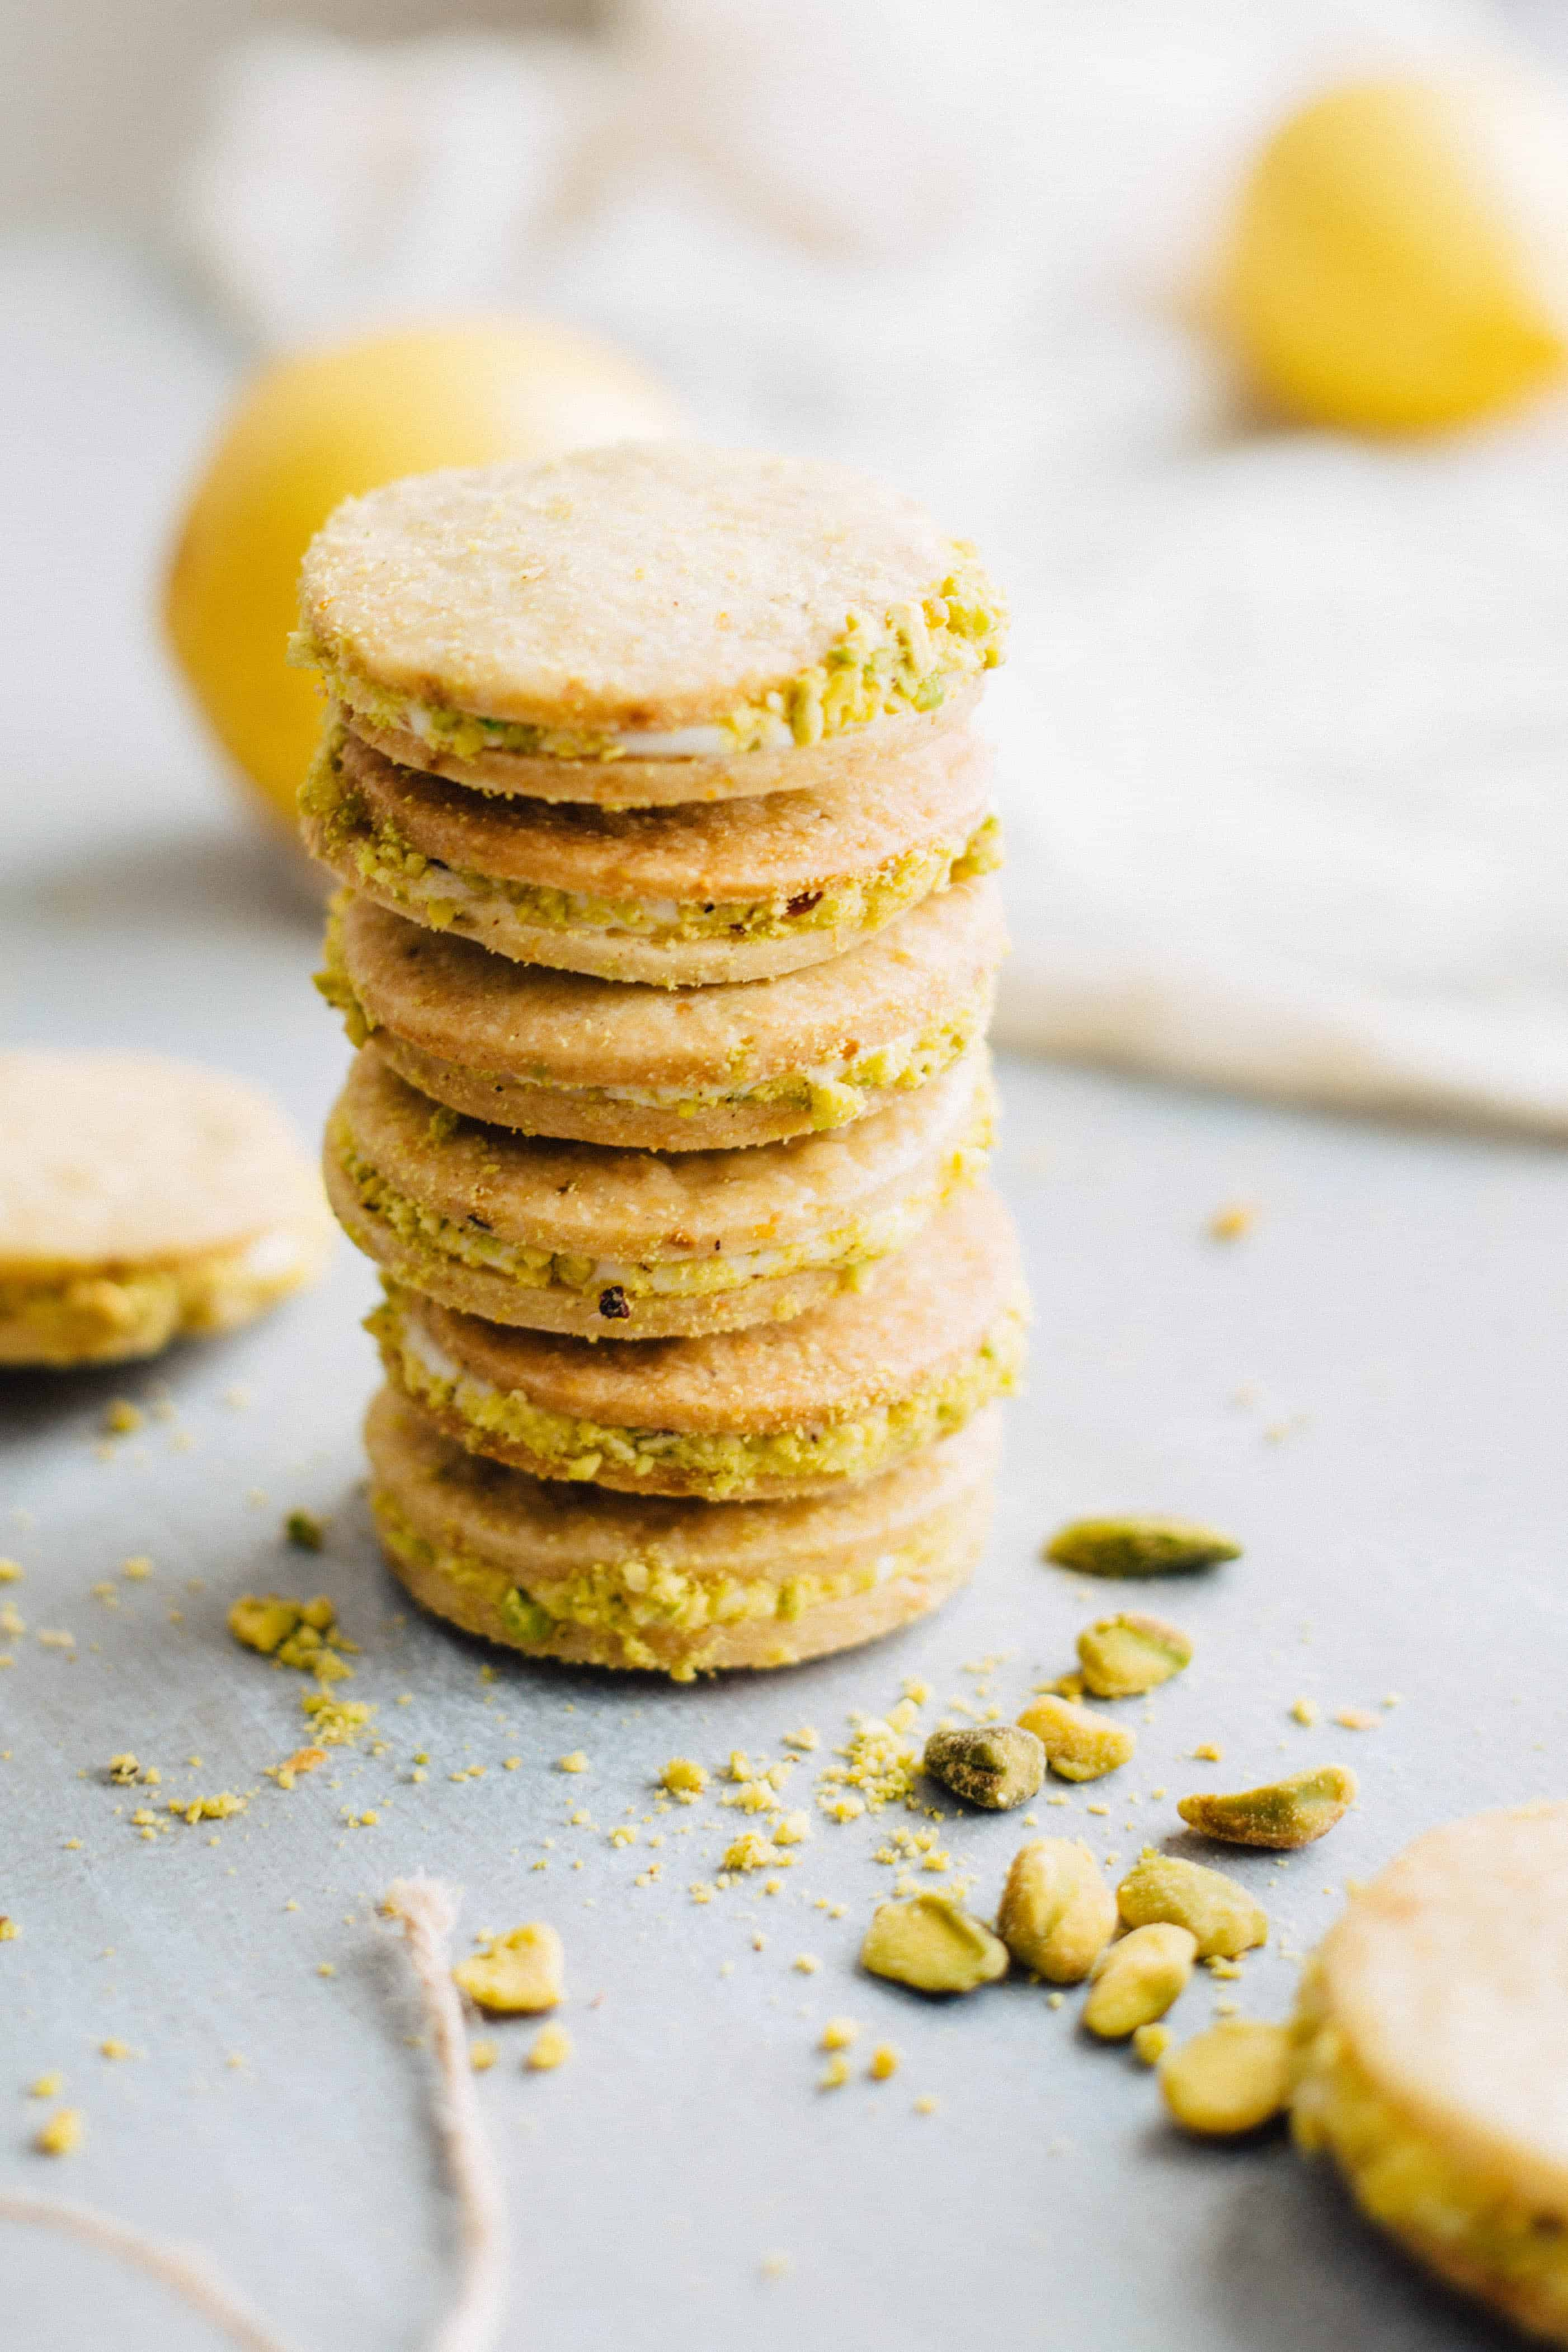 Vertical stack of six lemon pistachio sandwich cookies.